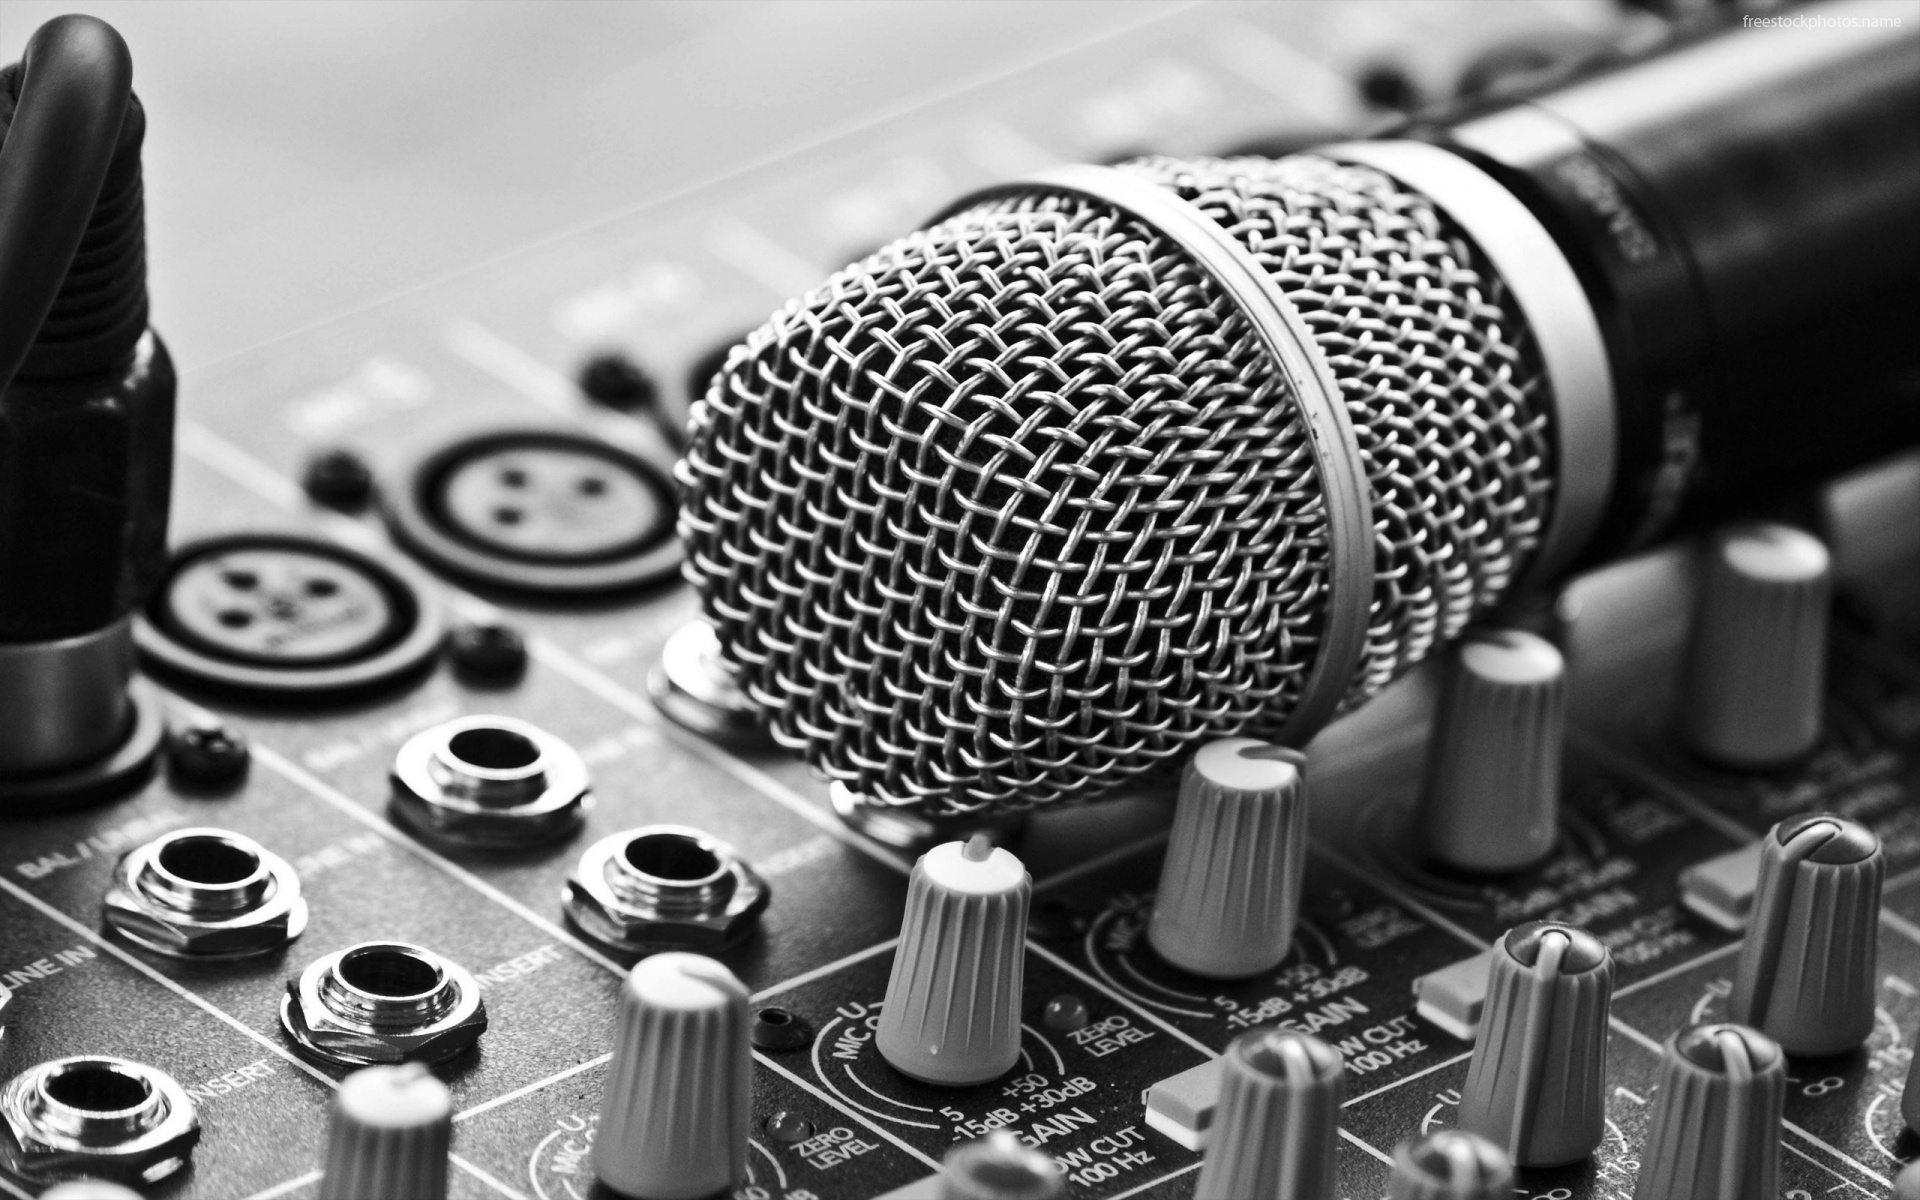 Local Event Sound System Rental In Kansas City Topeka St Joseph